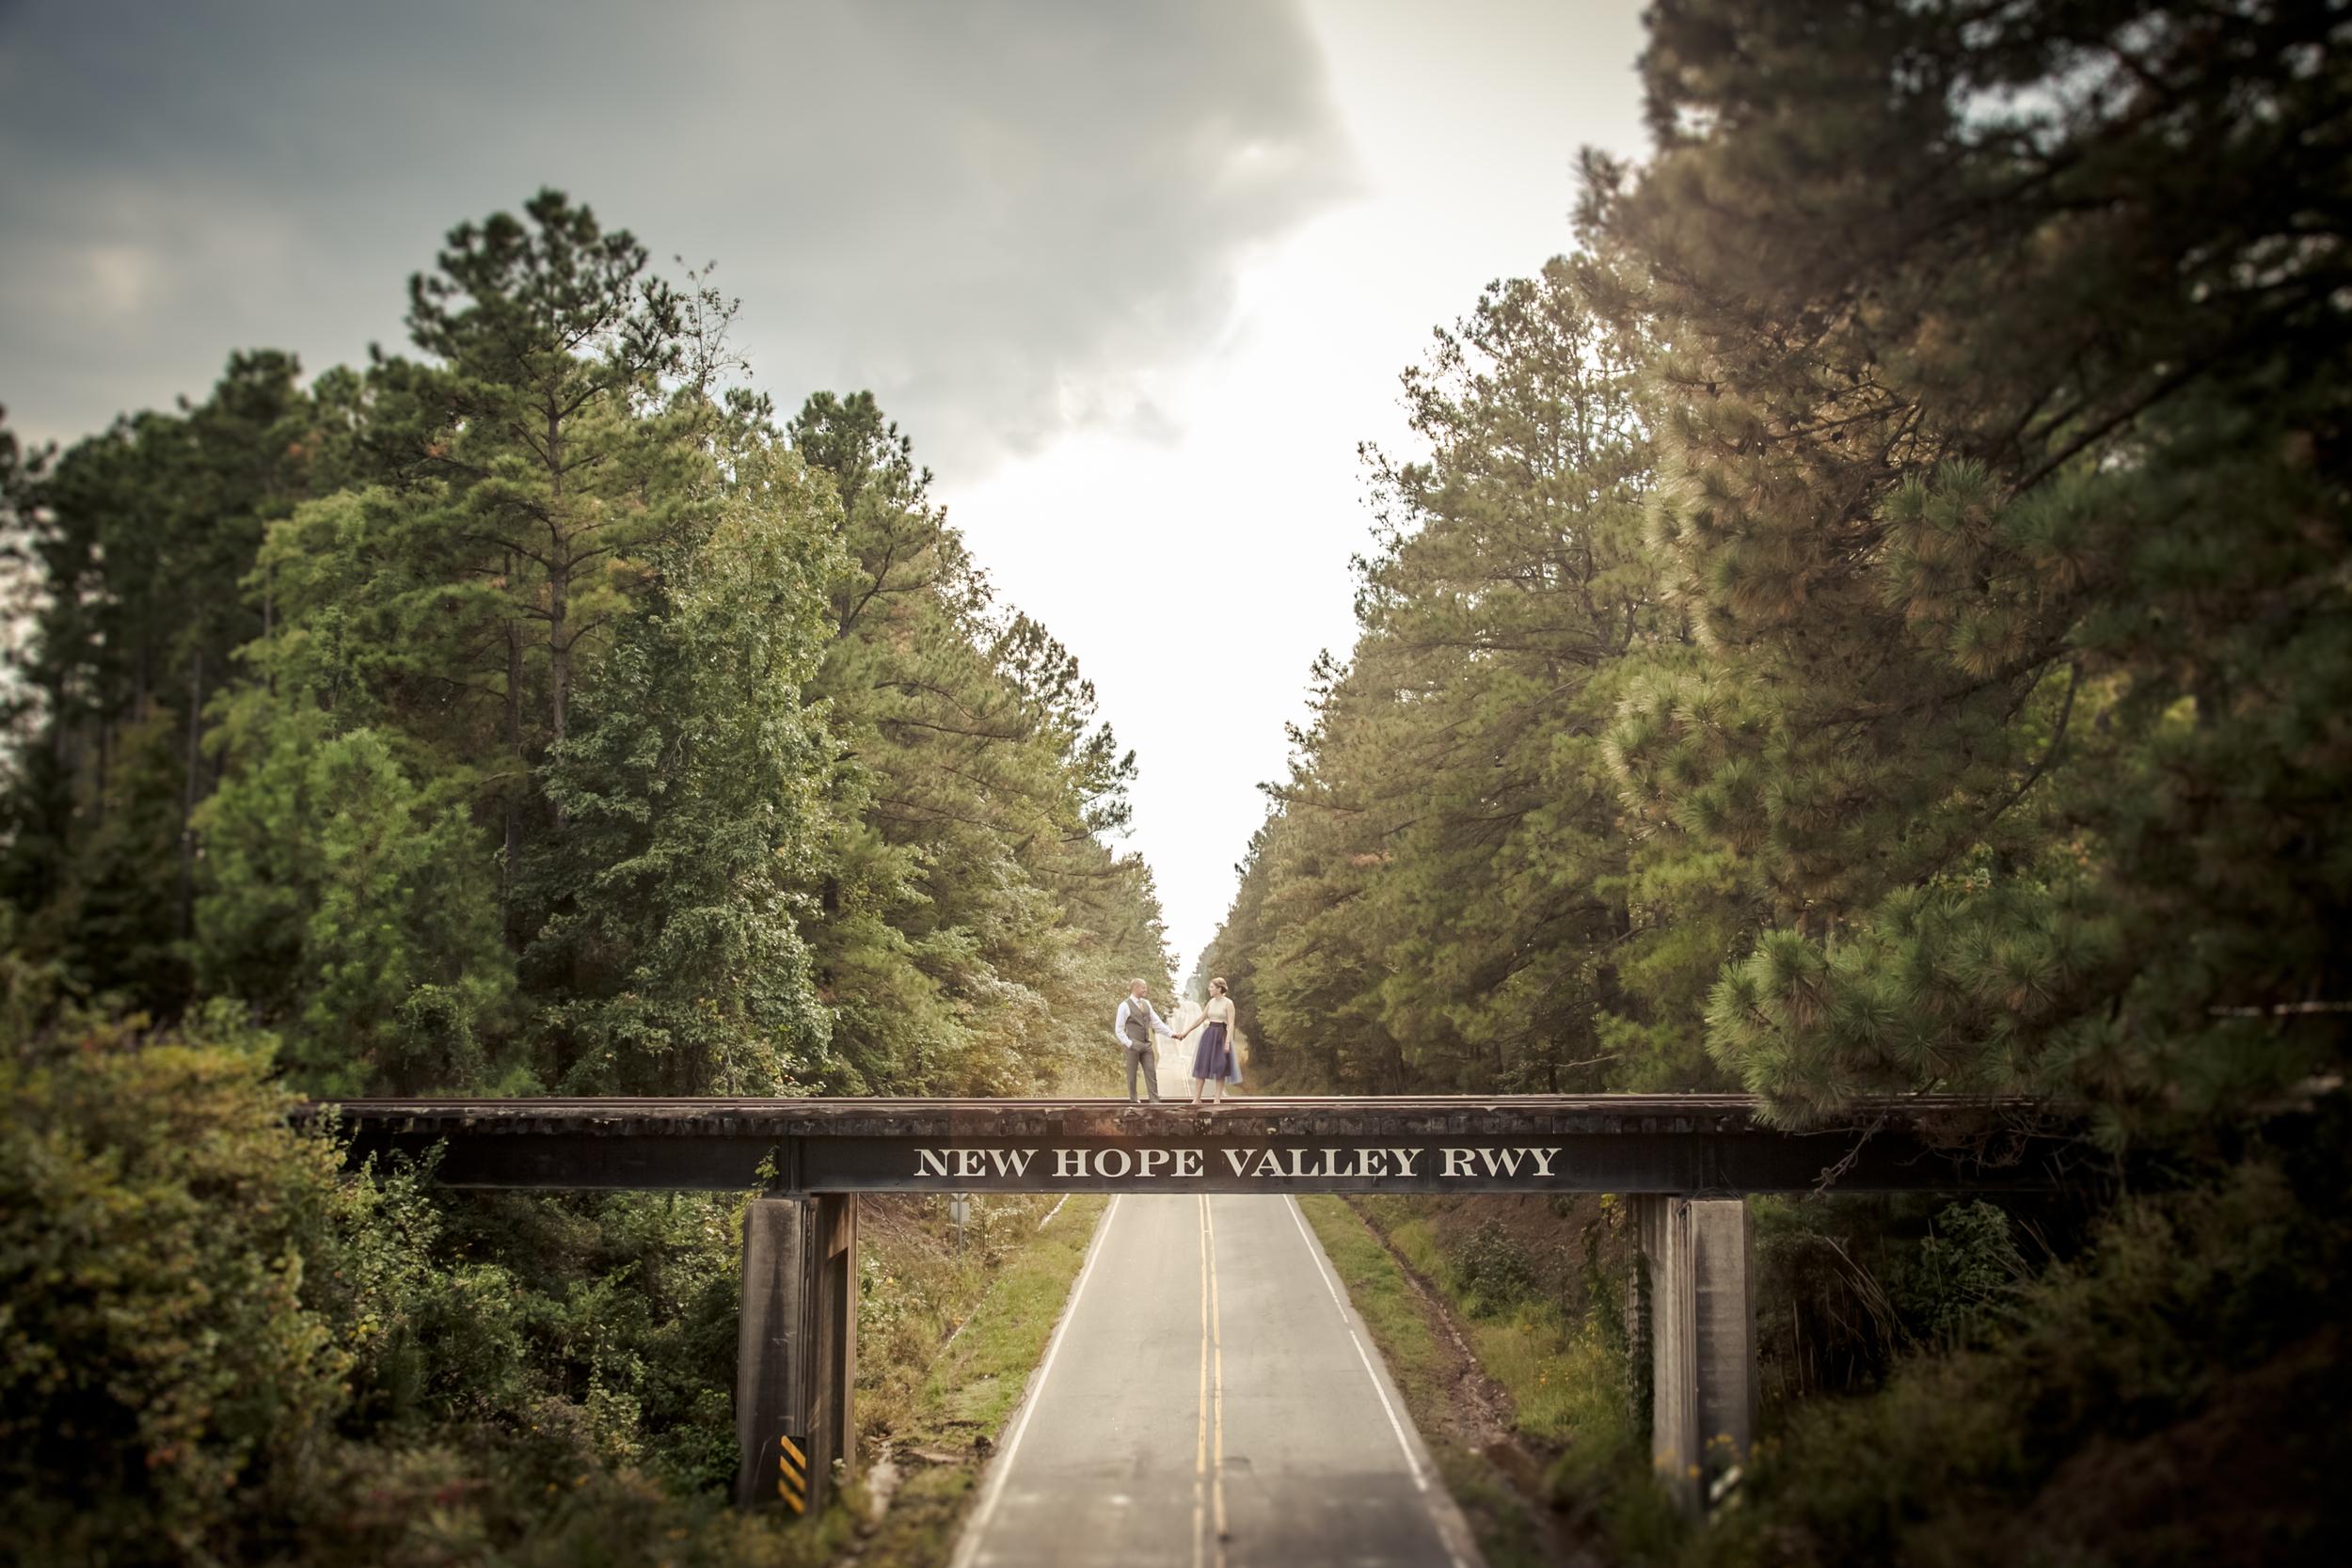 Richard Barlow Photography - Engagement Photos & Engagement Photography in North Carolina